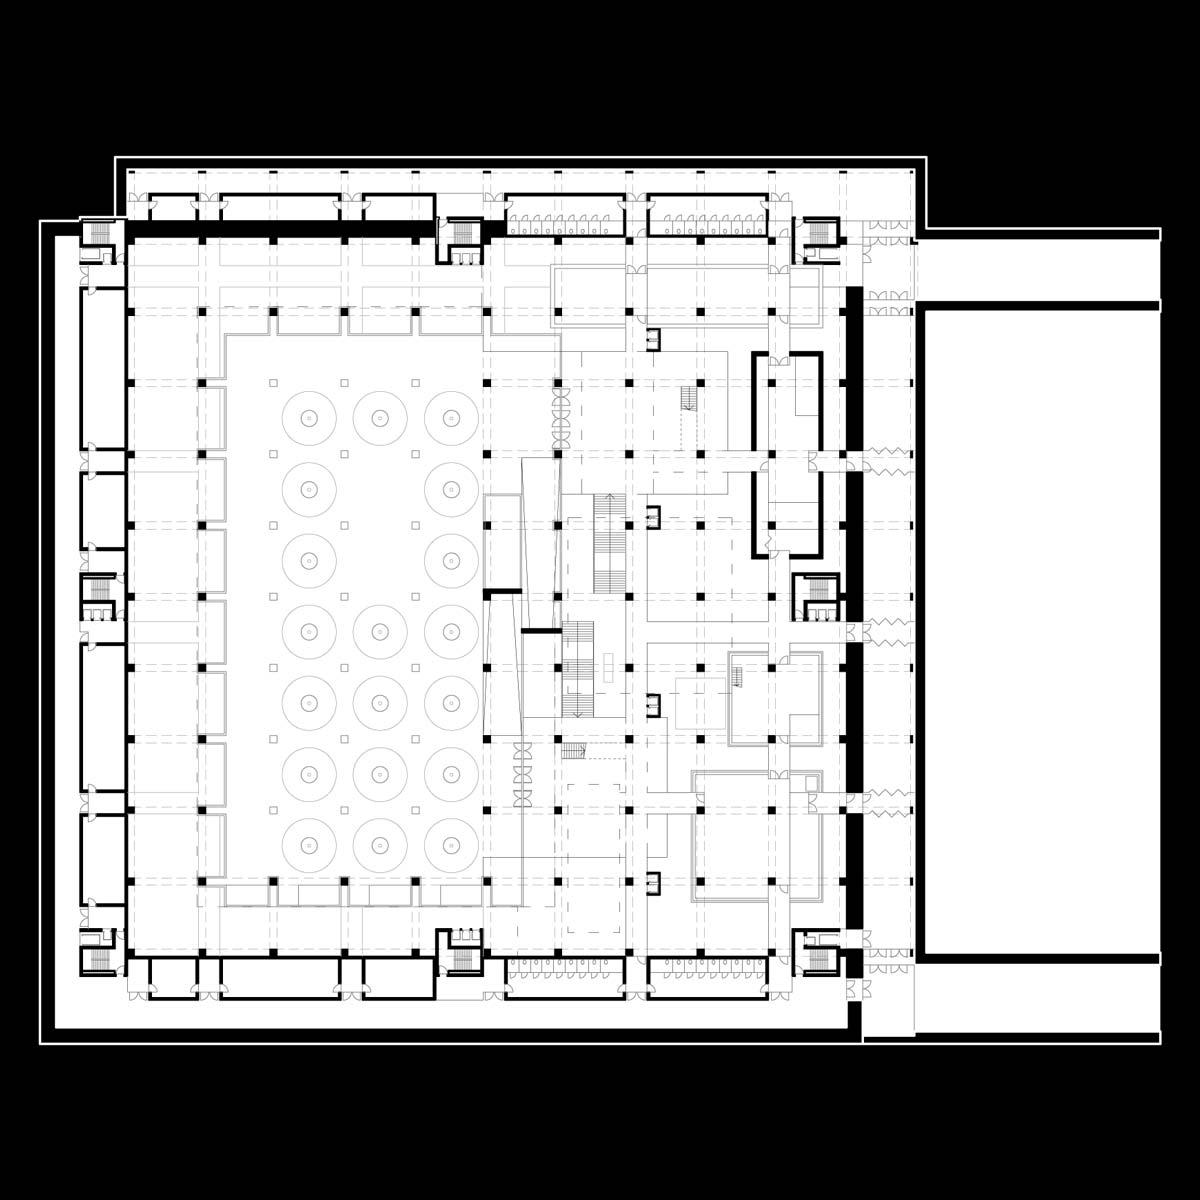 Degli-Esposti-Architetti_Helsinki-Central-Library_11